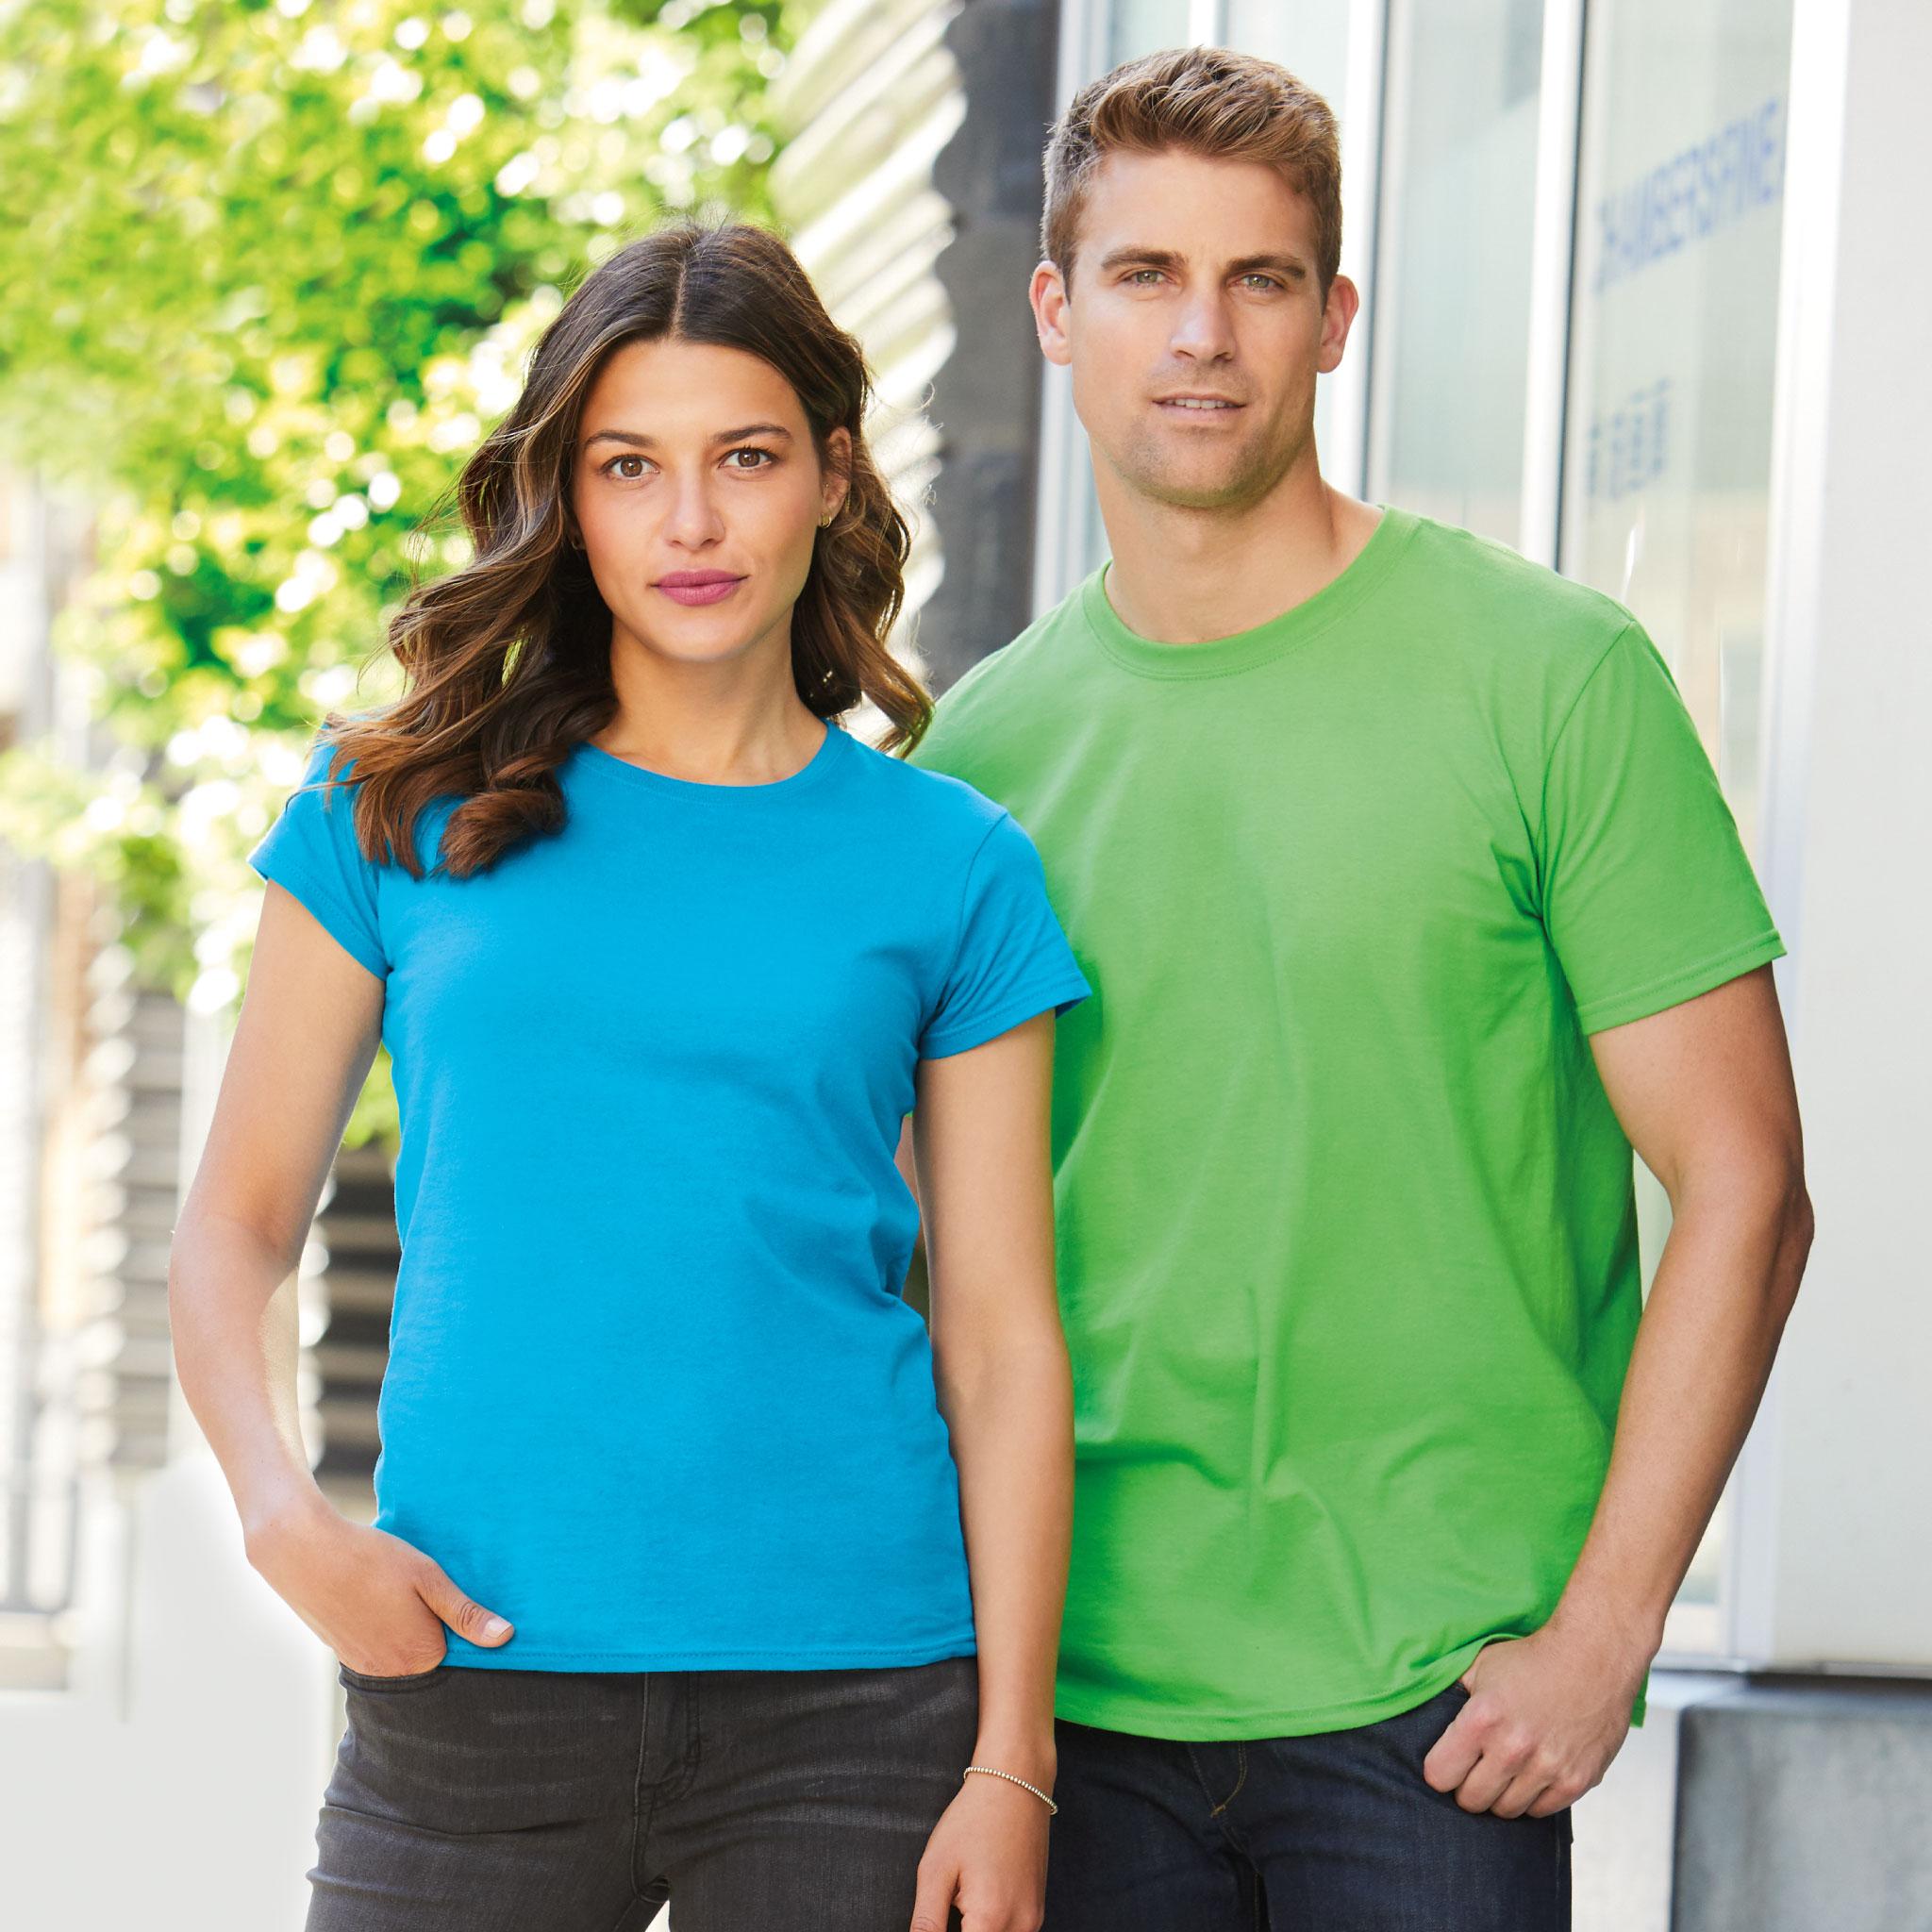 Mens & Womens T-Shirts